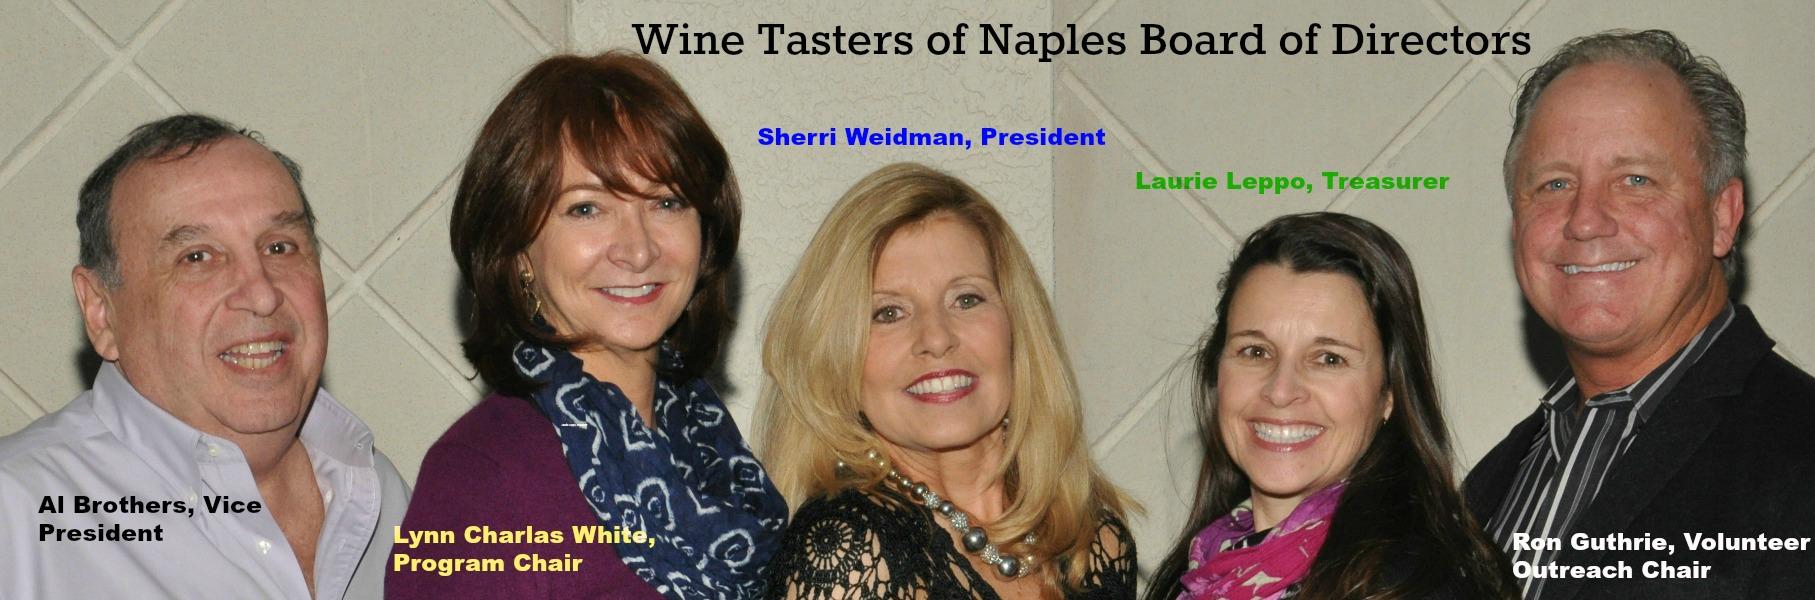 Wine Tasters of Naples, Board of Directors